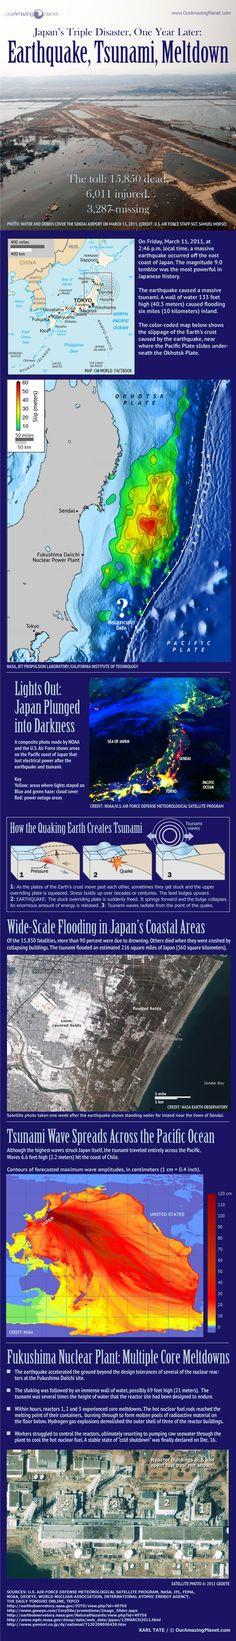 Looking Back on Fukushima